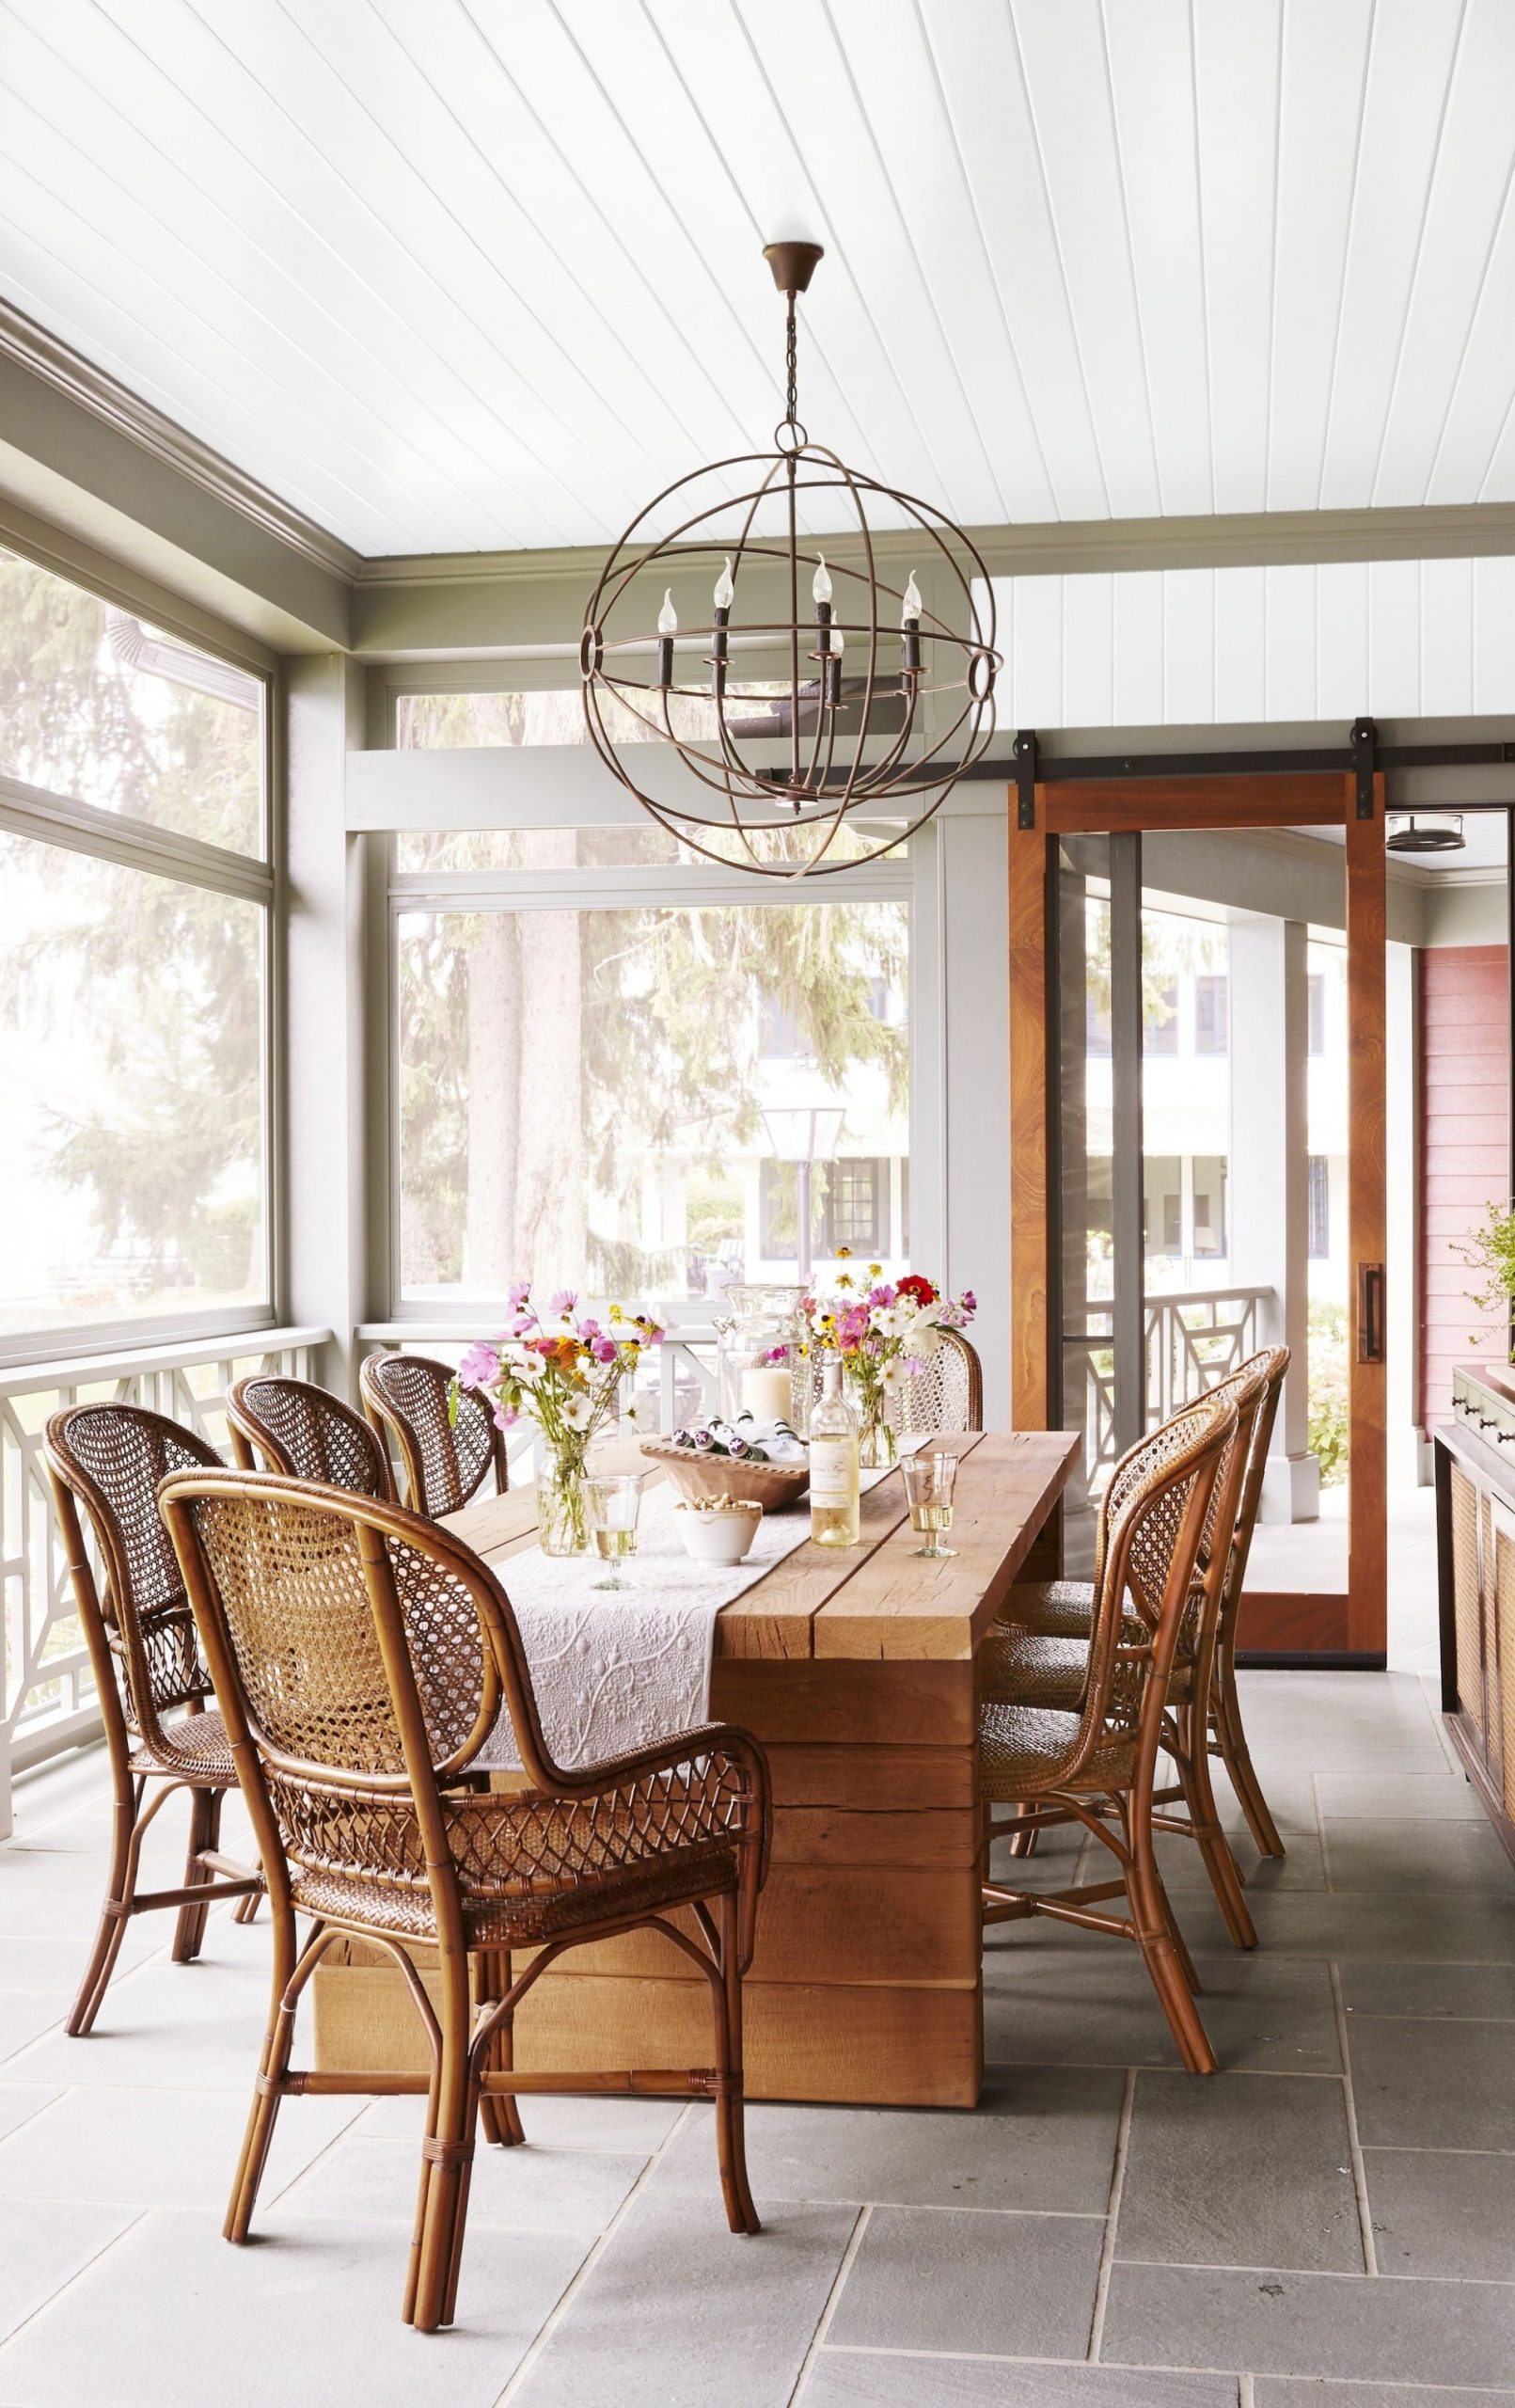 8 Sunroom Decorating Ideas - Best Designs for Sun Rooms - Sunroom Dining Room Ideas